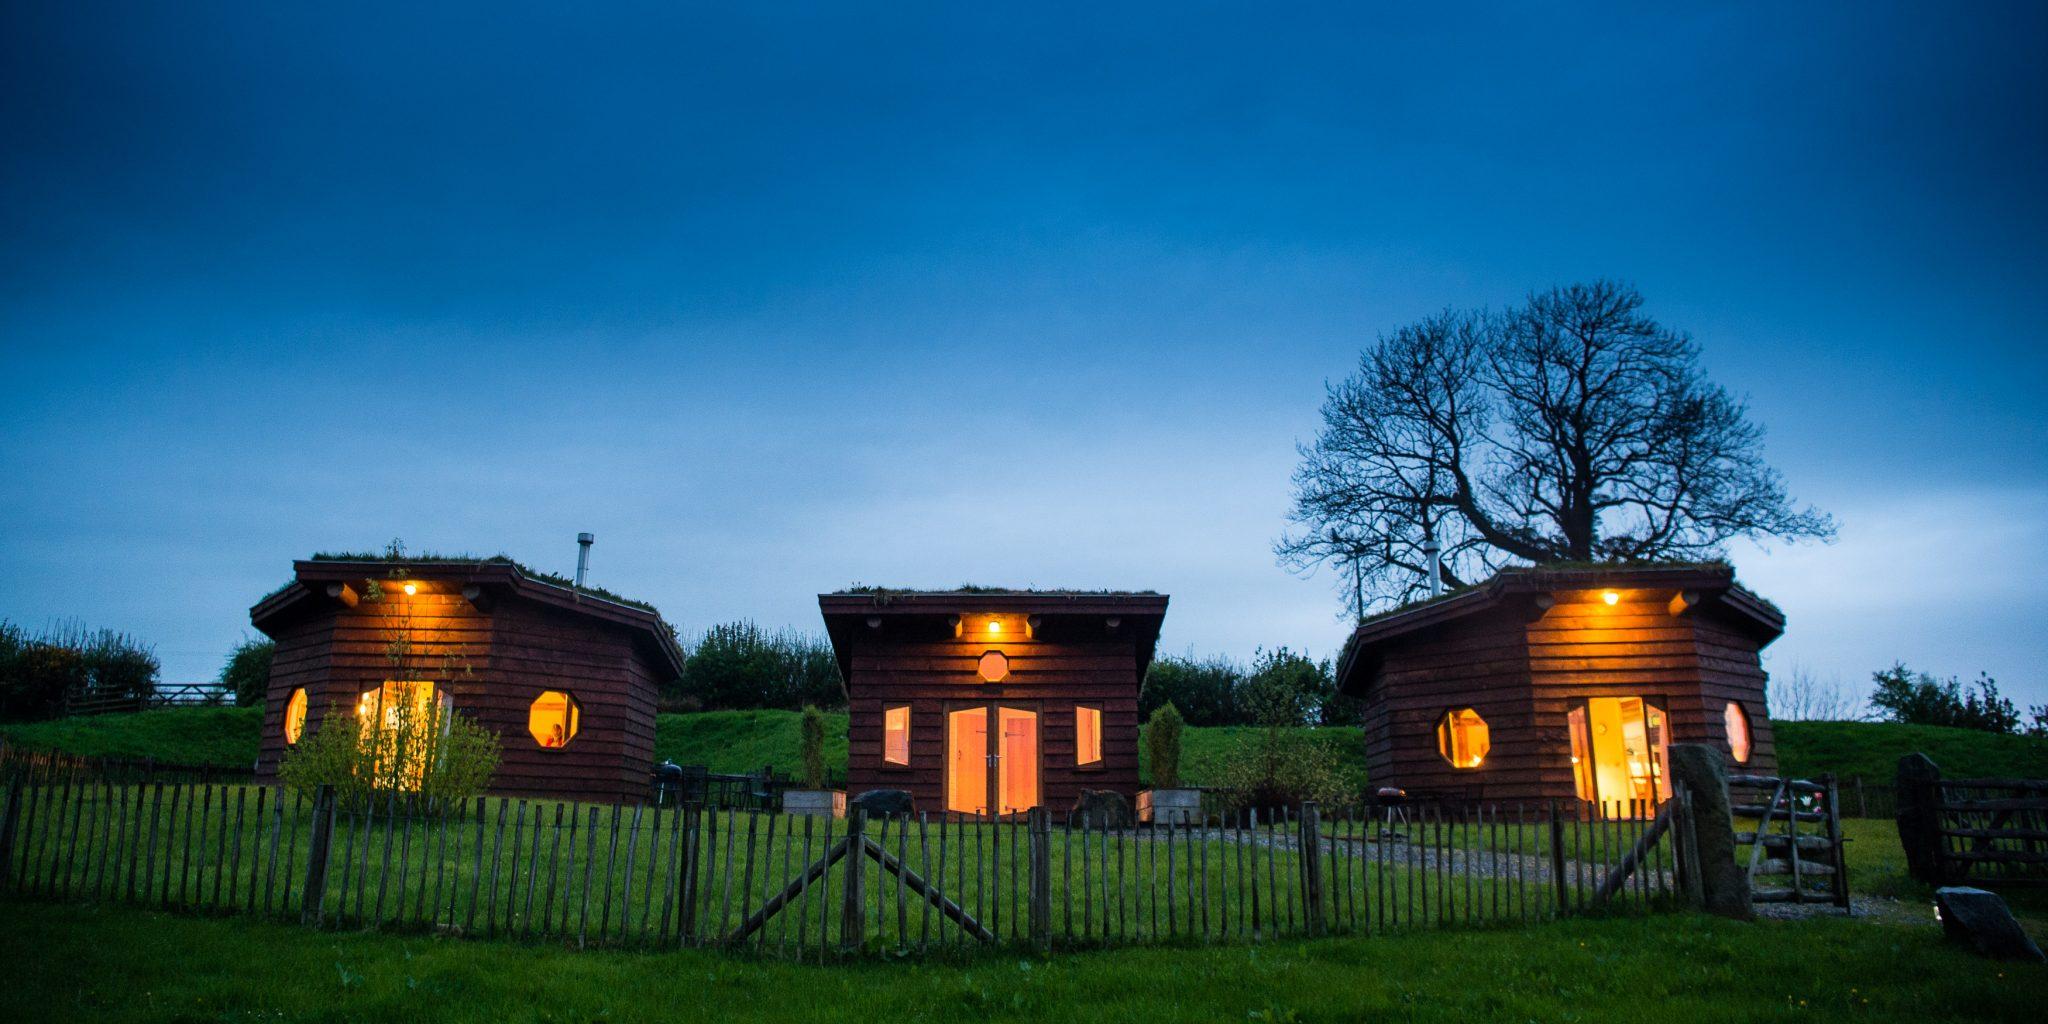 Treberfedd Farm holiday accommodation , organic farm  and conference centre Dihewyd, Aeron valley, Ceredigion, Wales UK www.treberfedd.co.uk 01570 470672 May 08-10 2018  ©keith morris photography www.artswebwales.com  keith@artx.co.uk  07710 285968 01970 611106